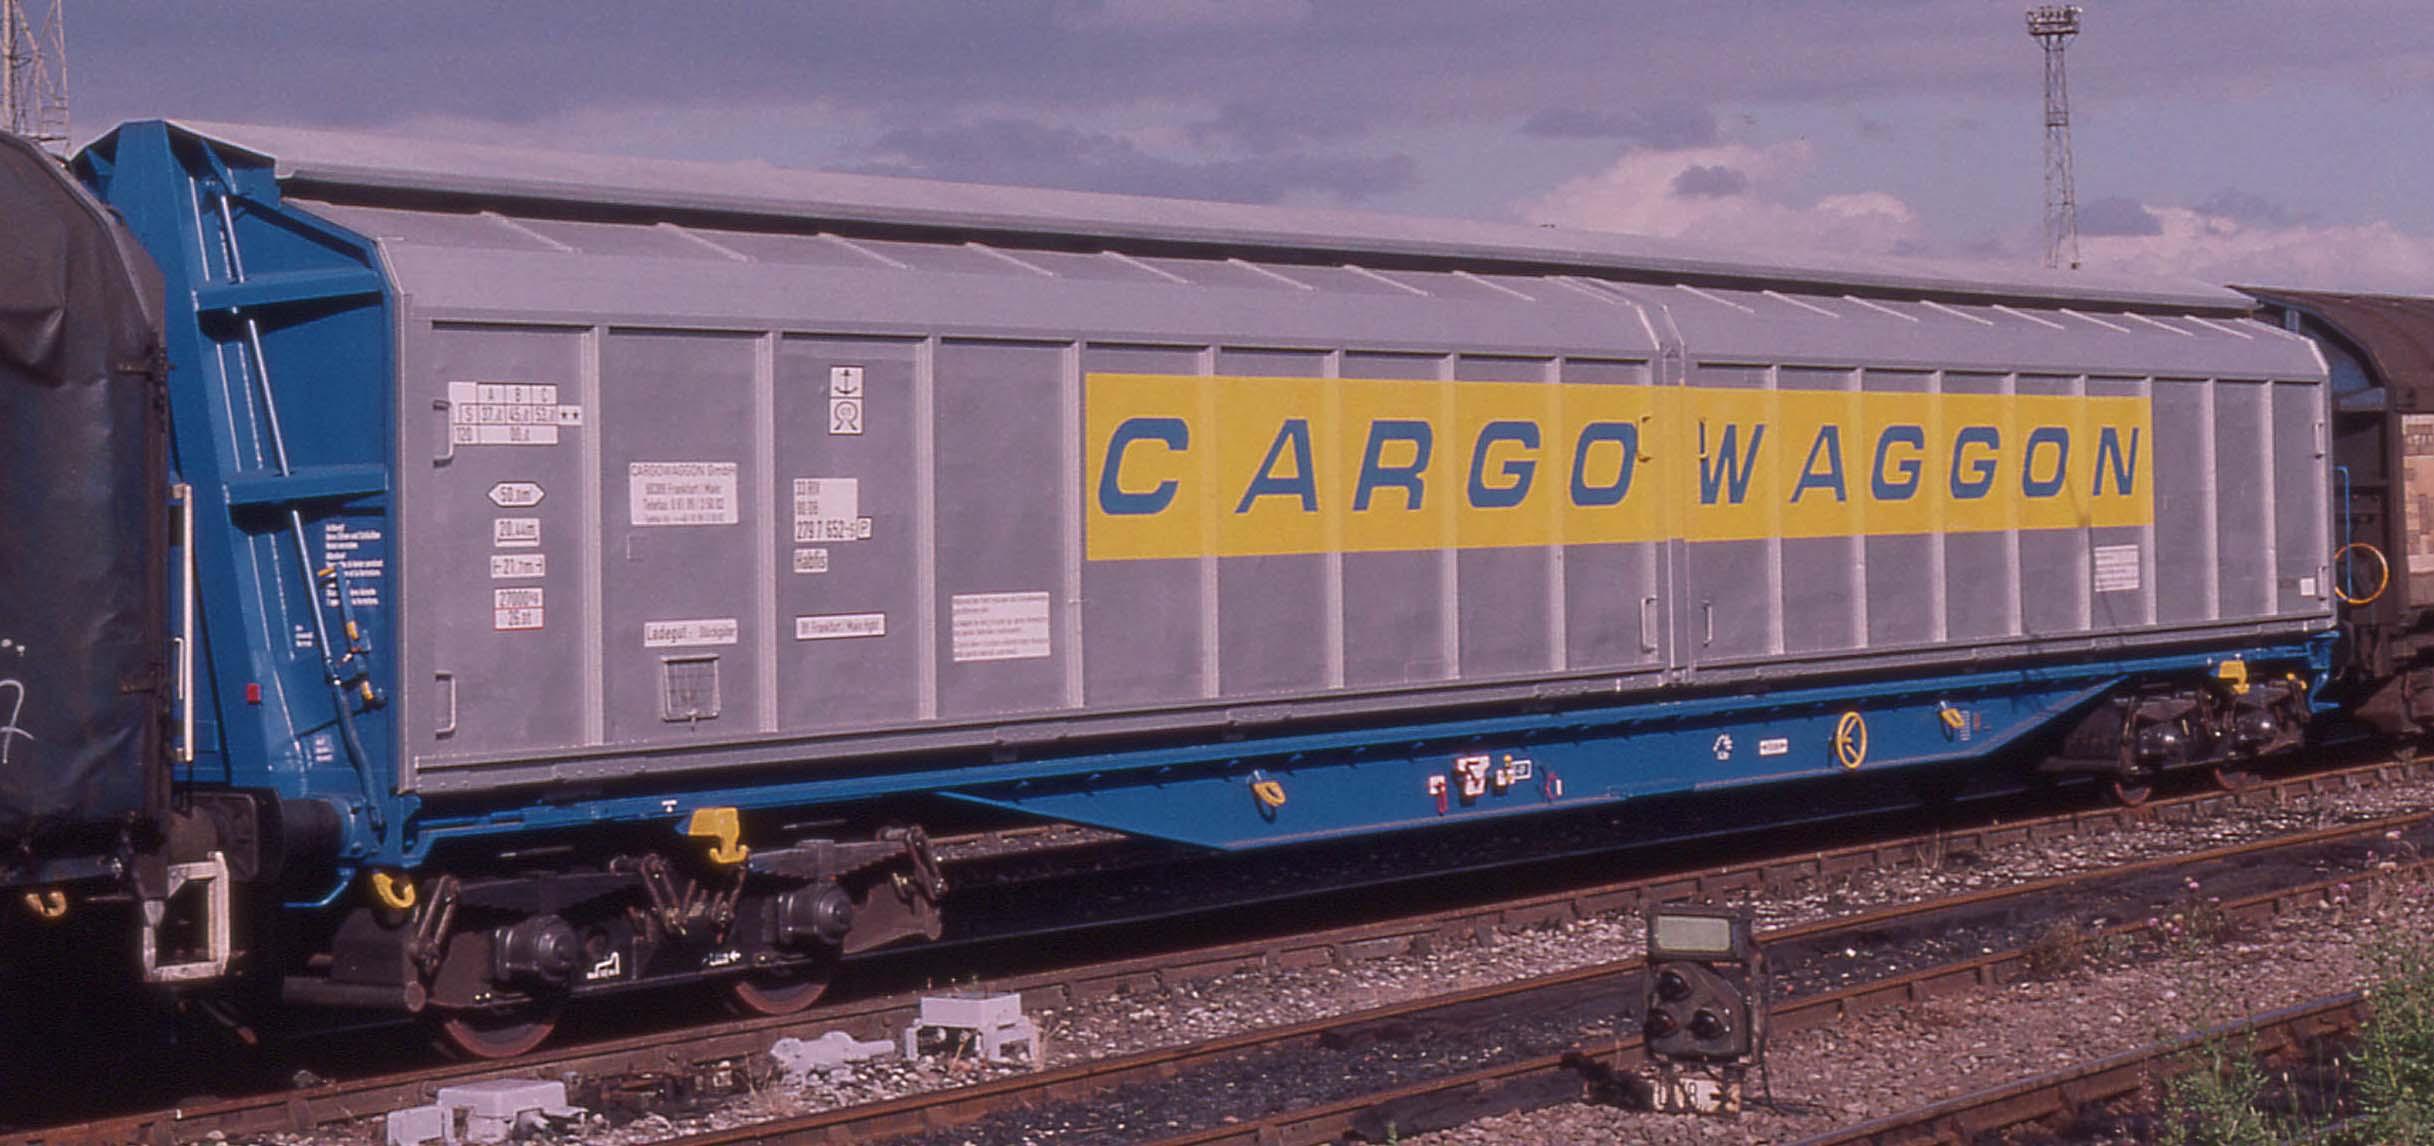 IWB Cargowaggon. © via Heljan